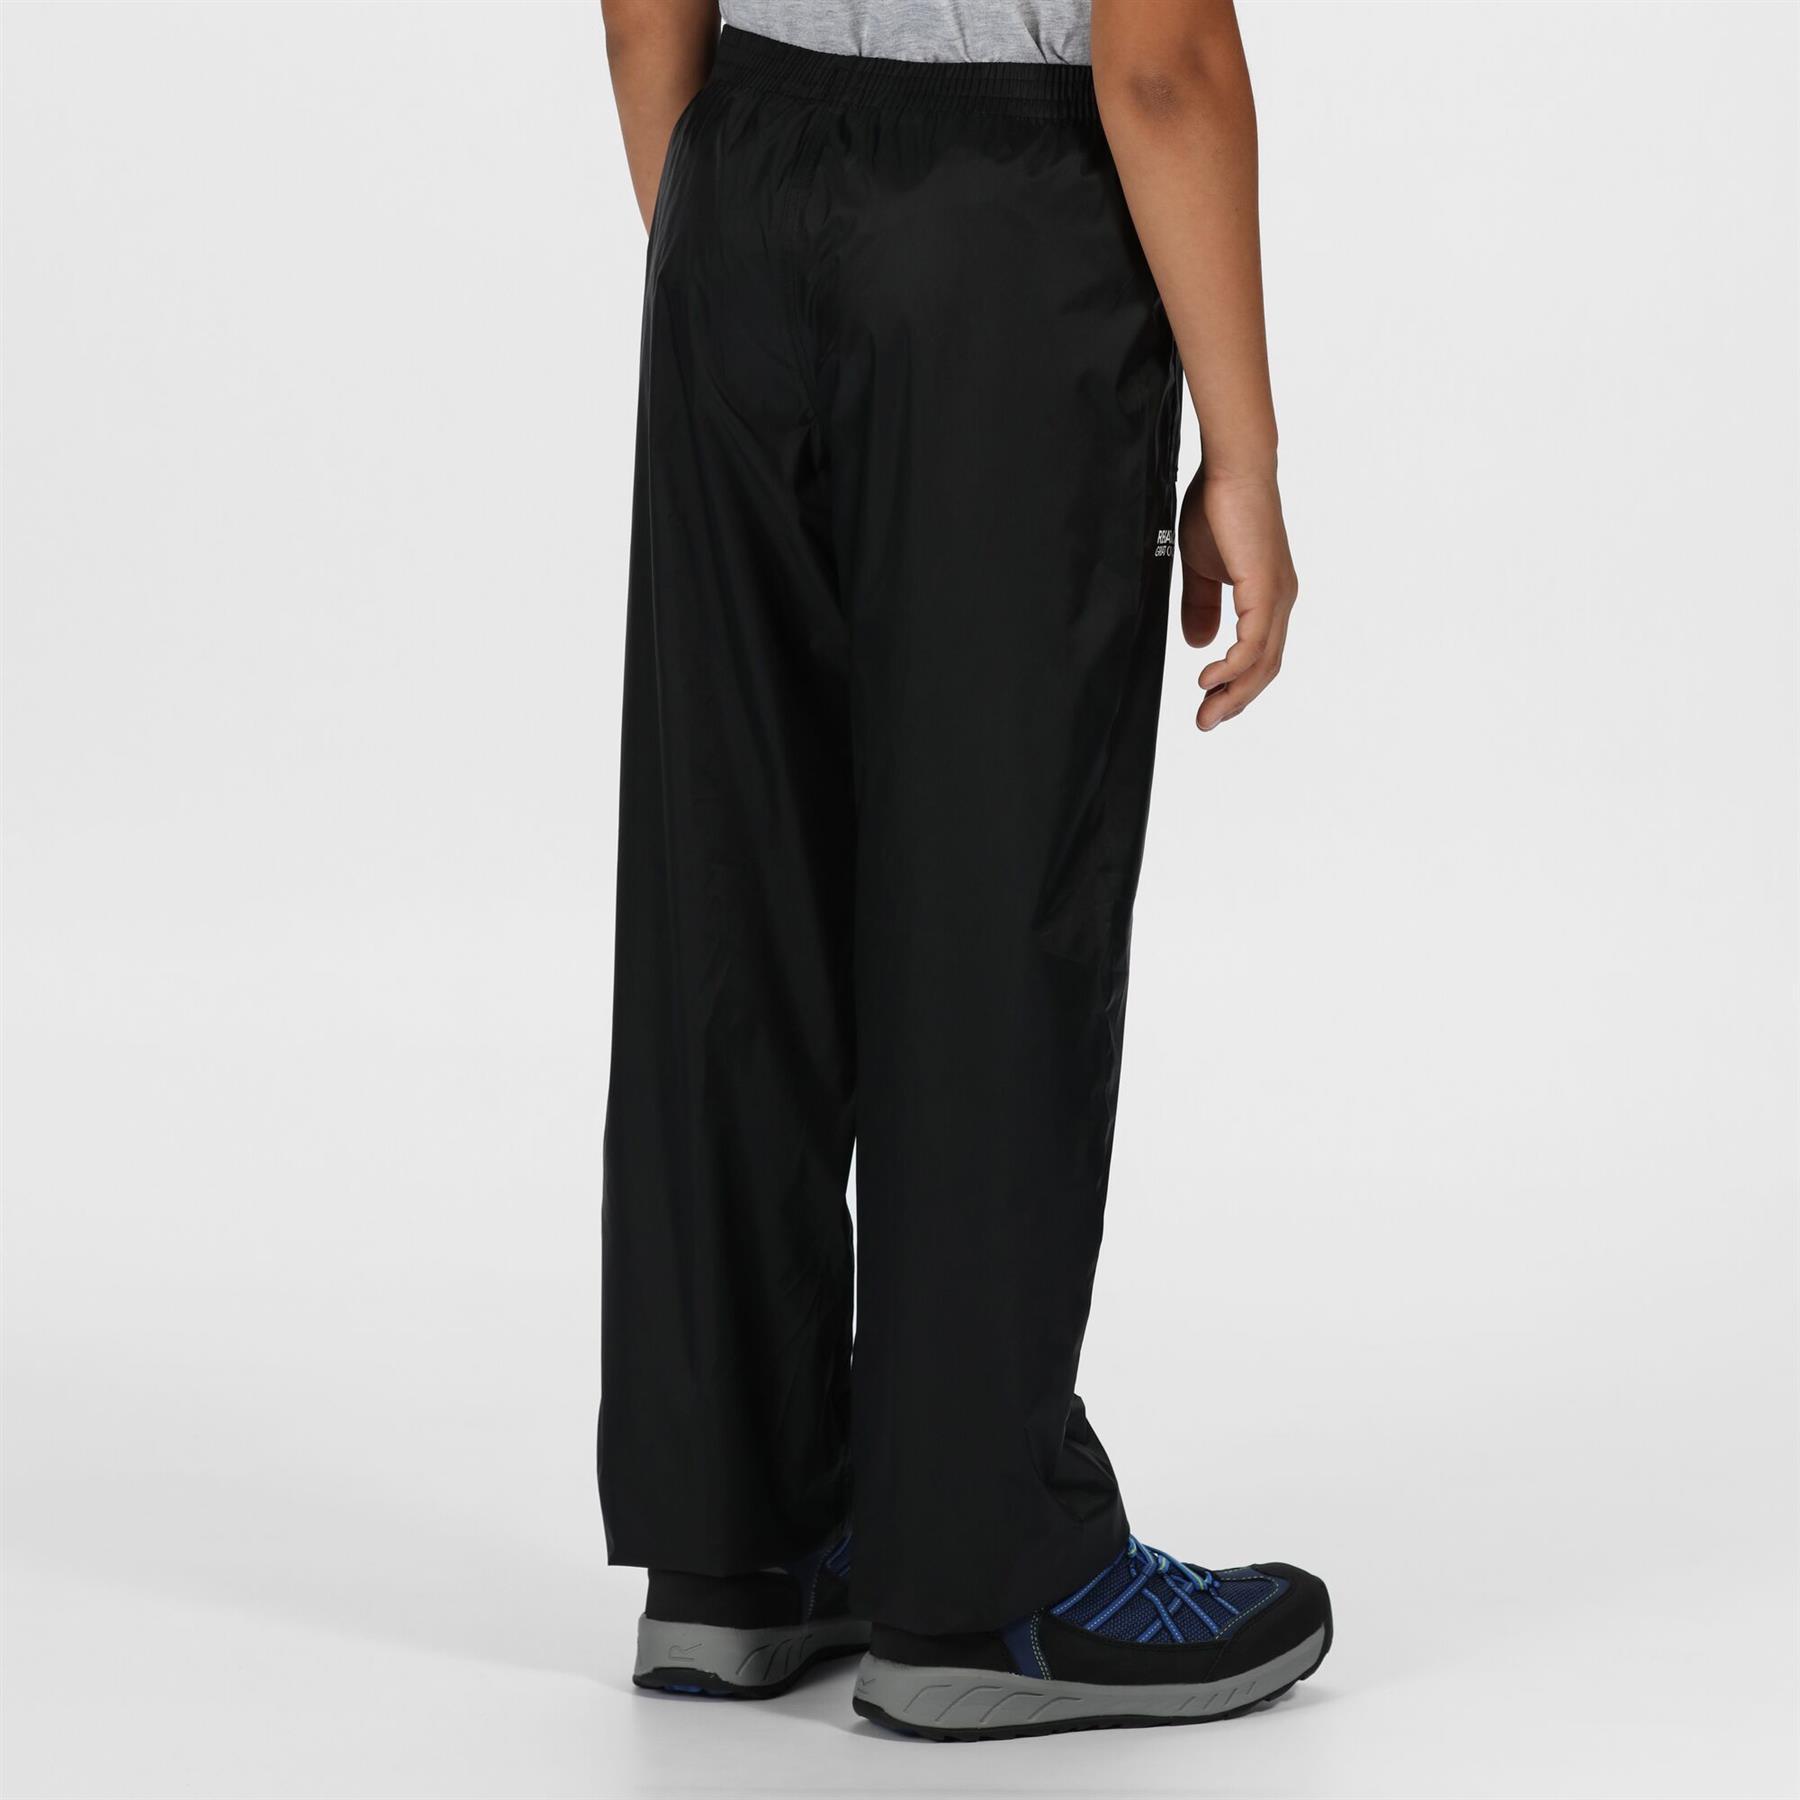 miniatuur 4 - Regatta Kids Pack It Waterproof Packable Overtrousers Boys Girls Trousers